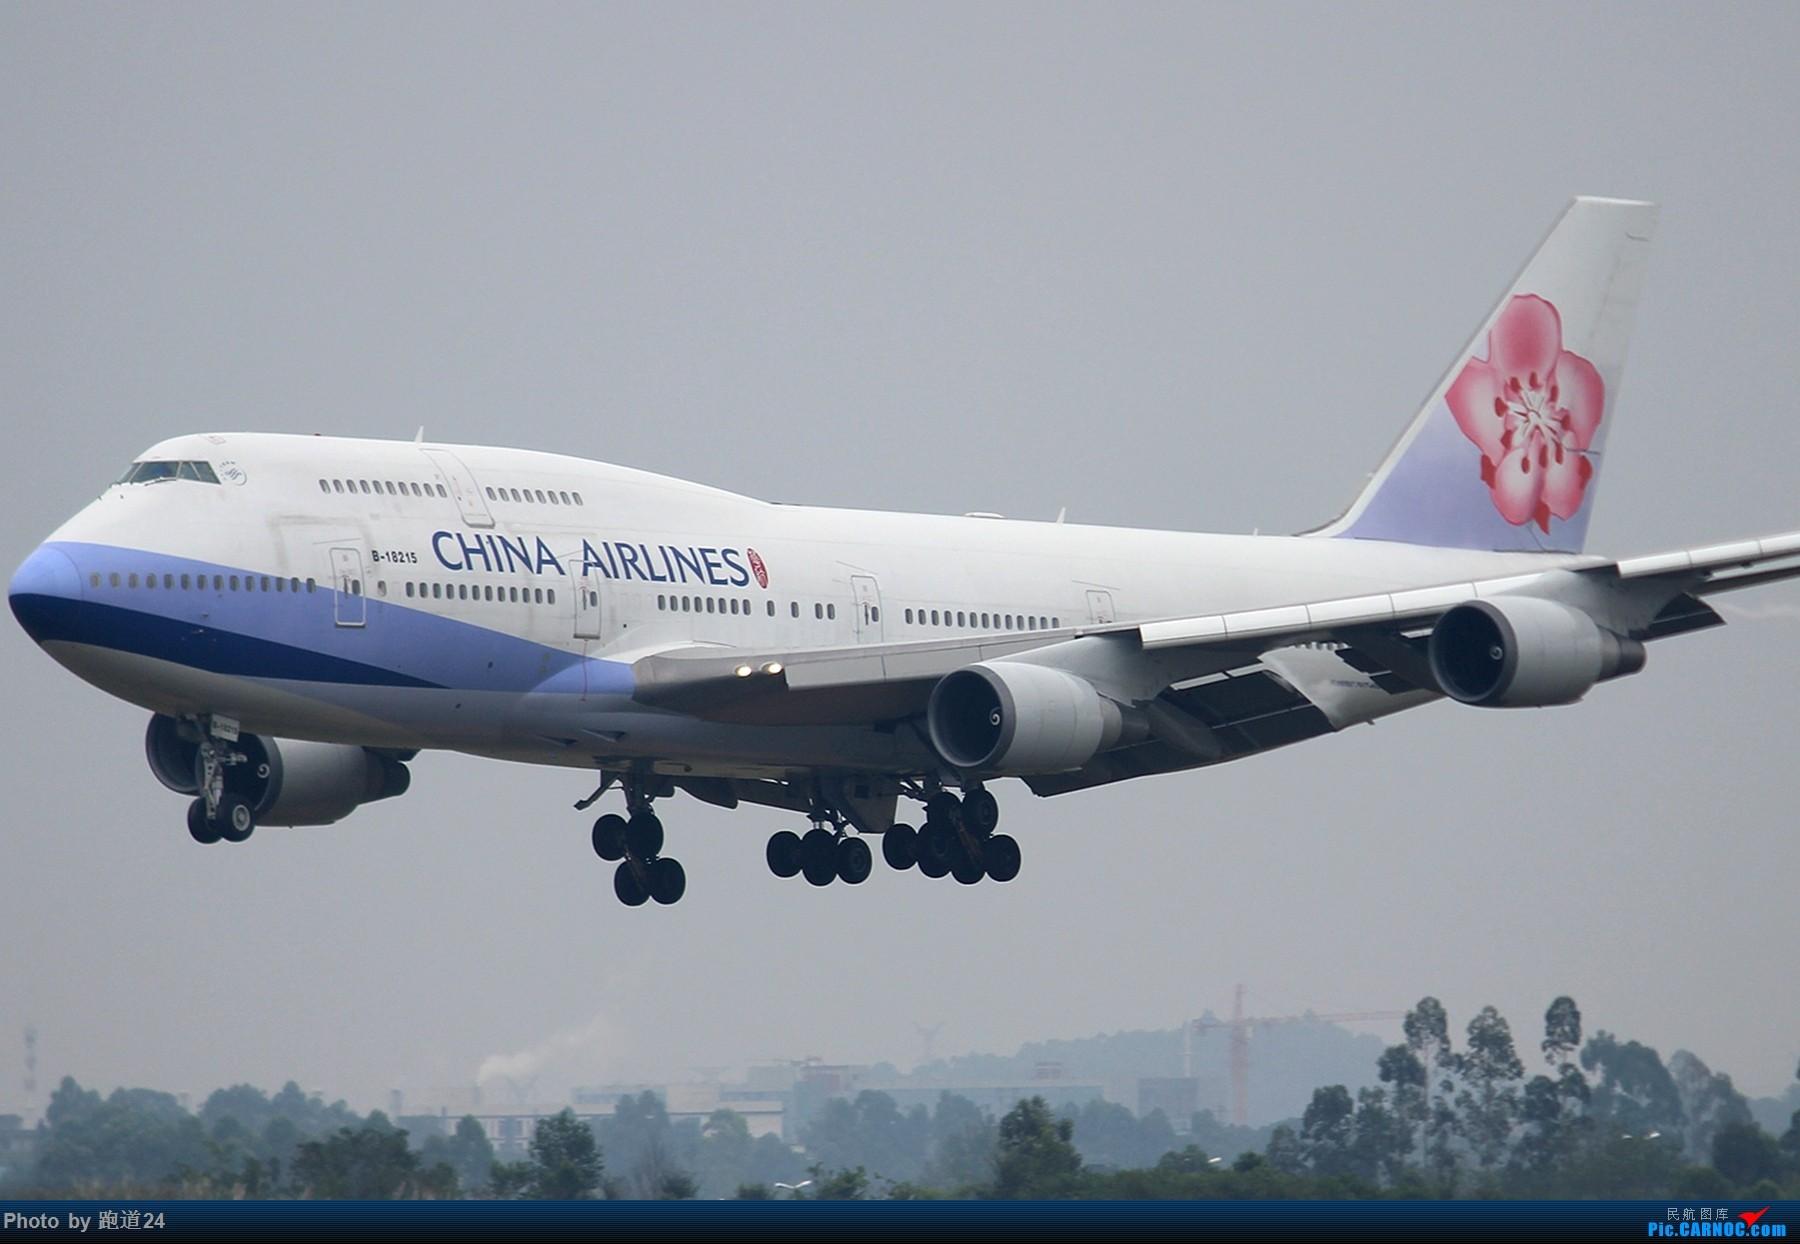 Re:[原创]【多图党】国庆烂天10.7拍机 1800*1200 BOEING 747-400 B-18215 中国成都双流国际机场